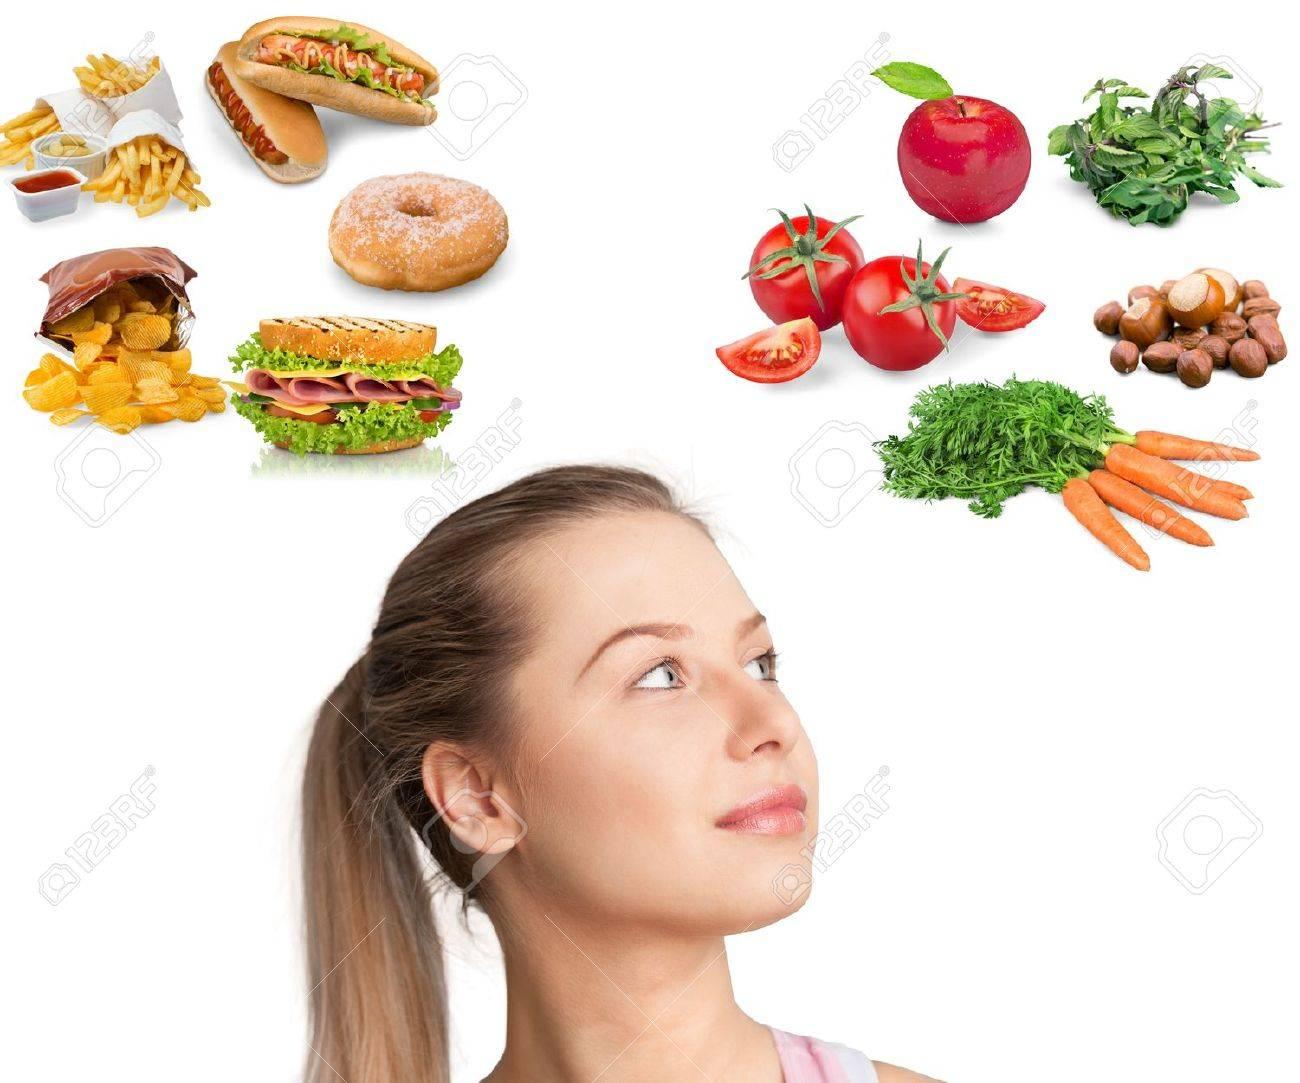 Food, junk, women. Stock Photo - 42370520